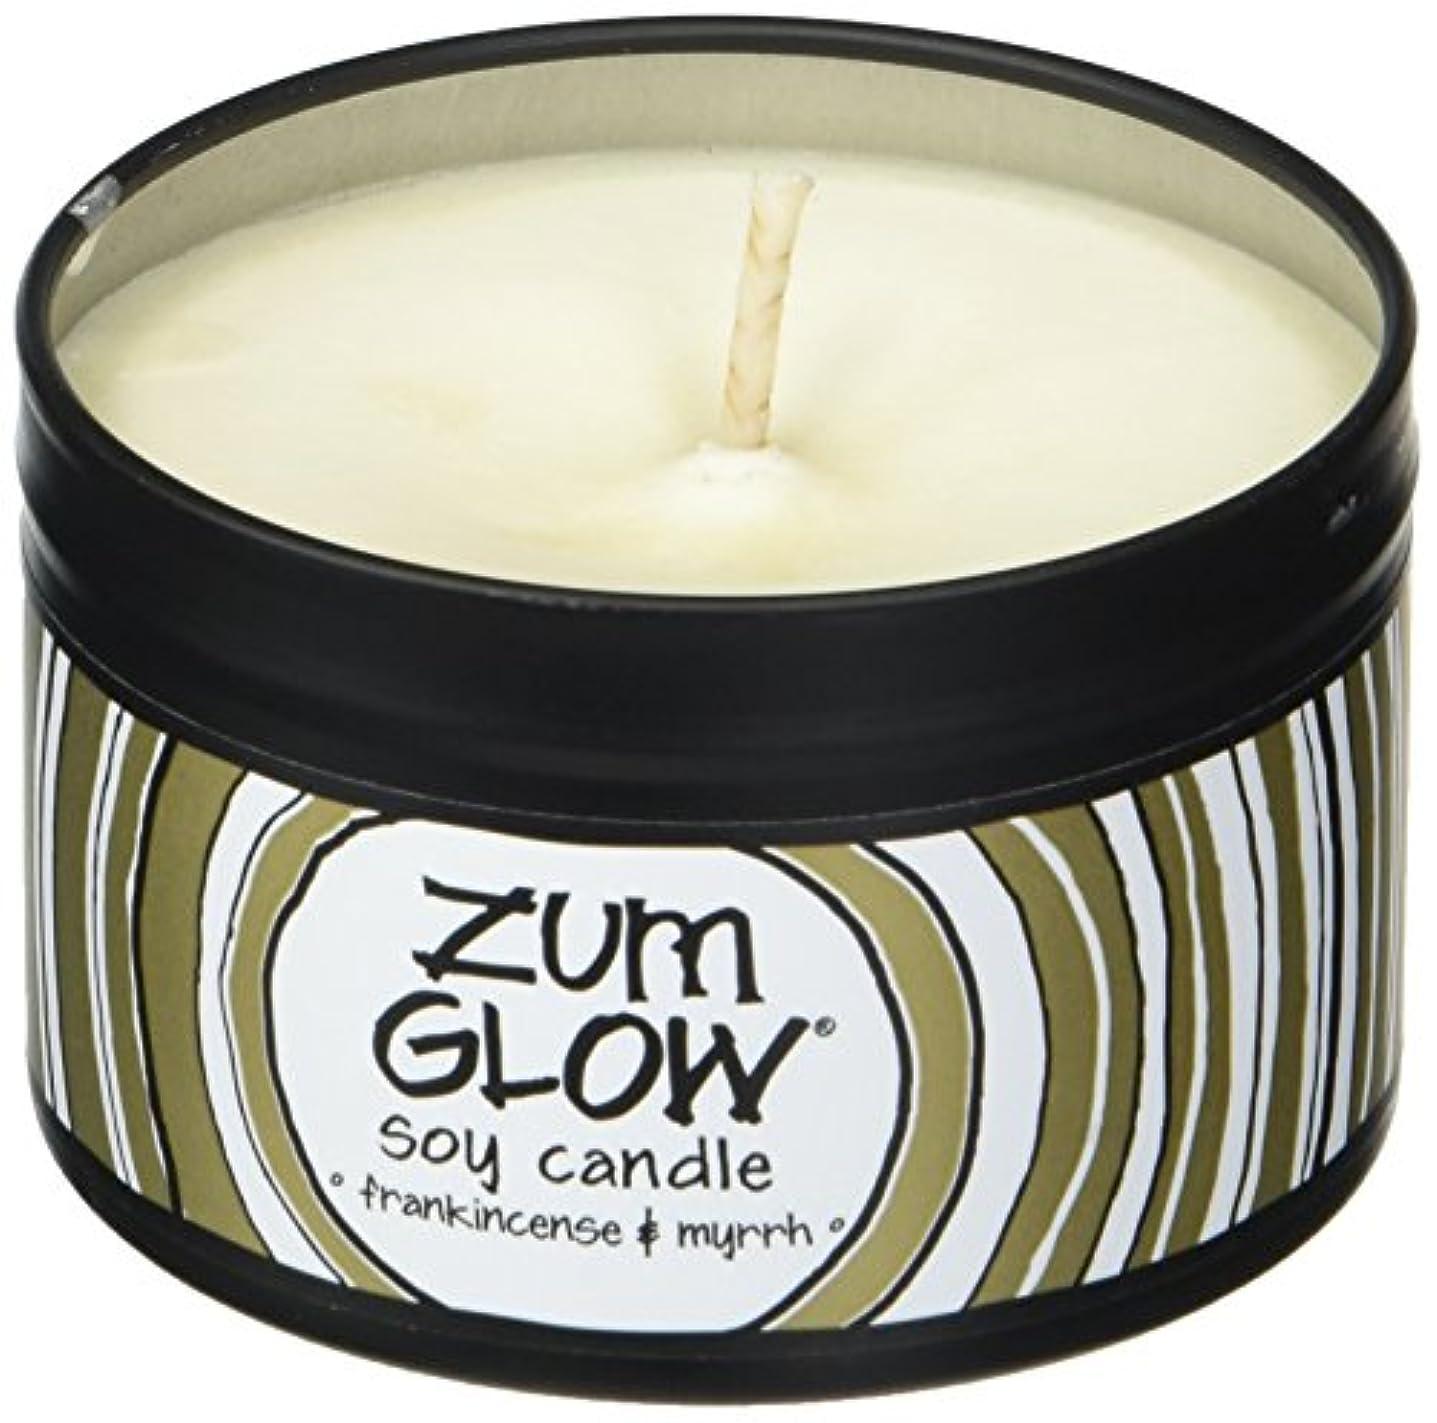 衣服精神的に災害Indigo Wild Zum Glow Soy Candles, Frankincense and Myrrh